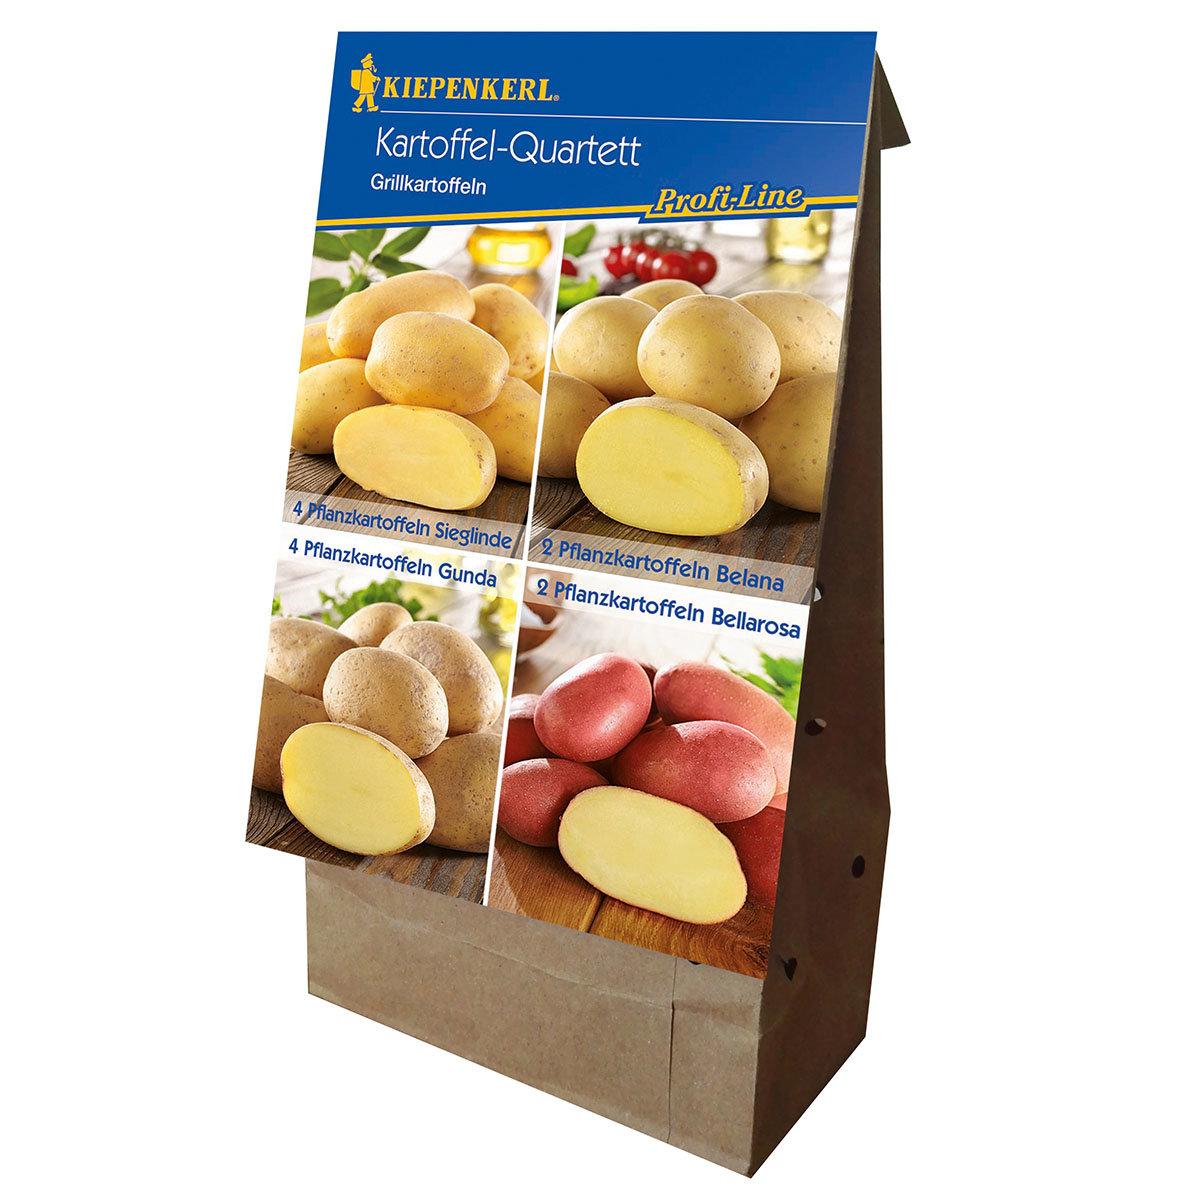 Kartoffel-Quartett Grillkartoffeln, 12 Stück | #3